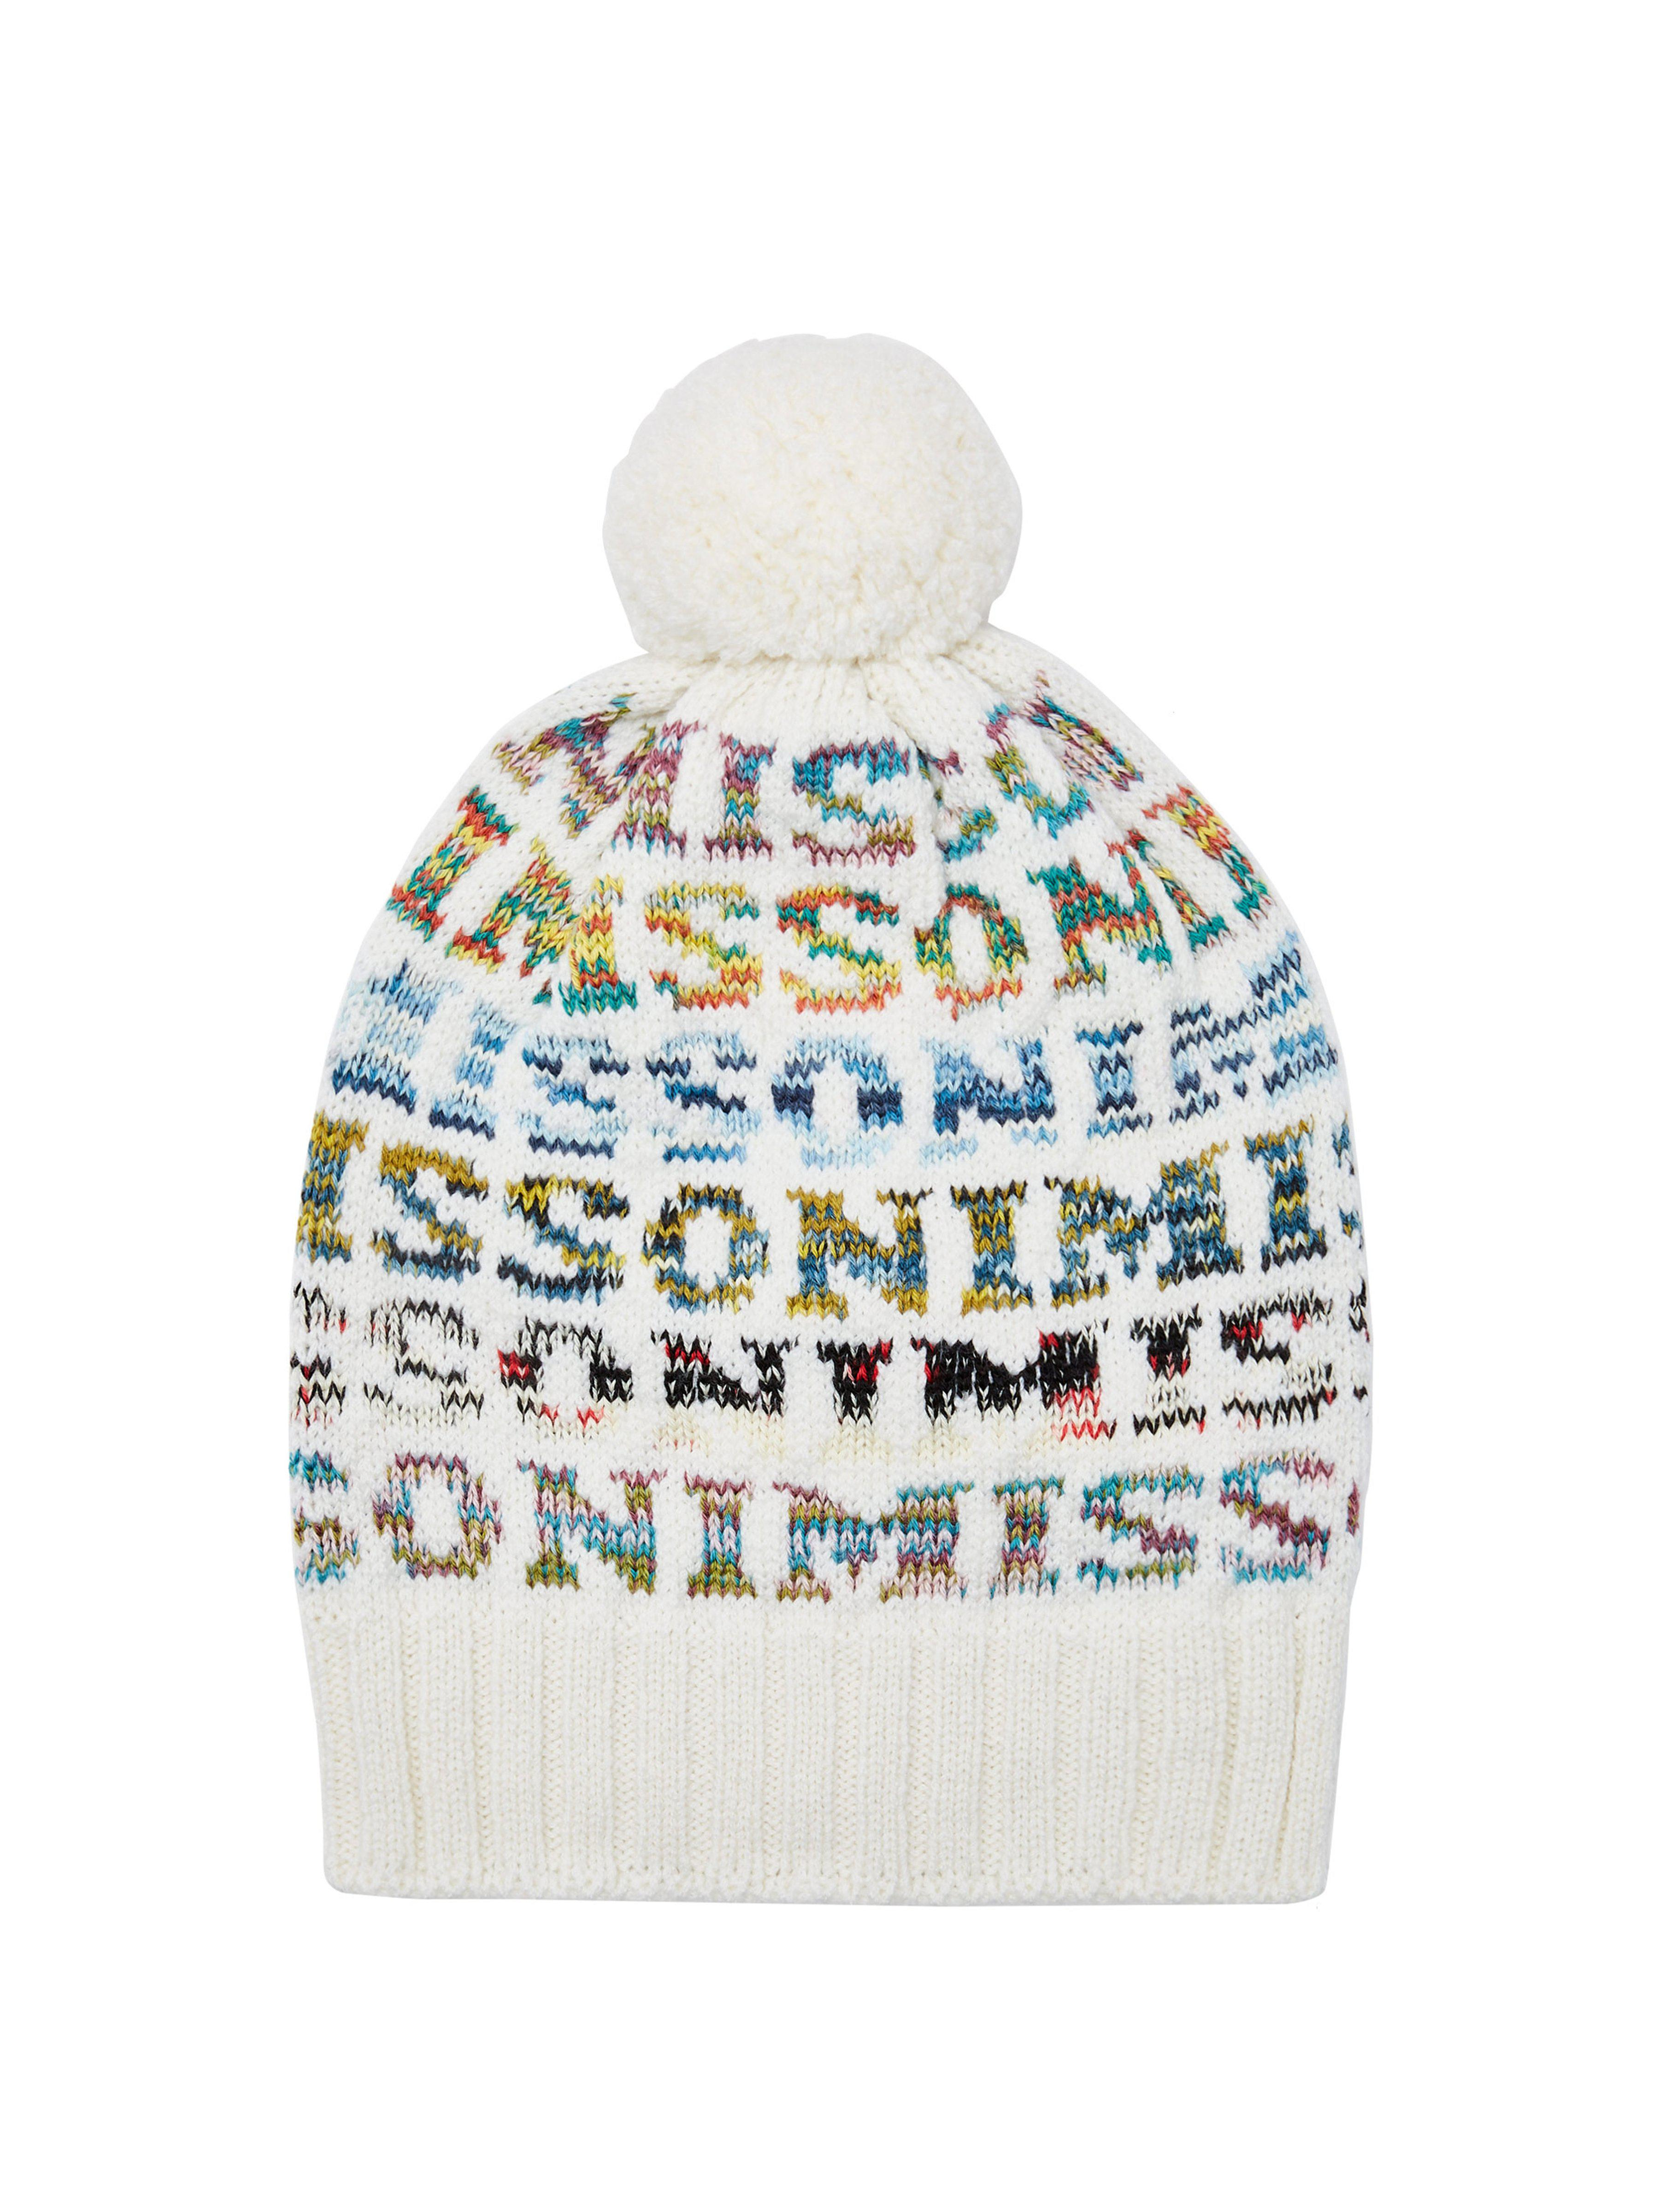 ab8c0f1c3ab Missoni - White Logo Knit Wool Beanie Hat - Lyst. View fullscreen